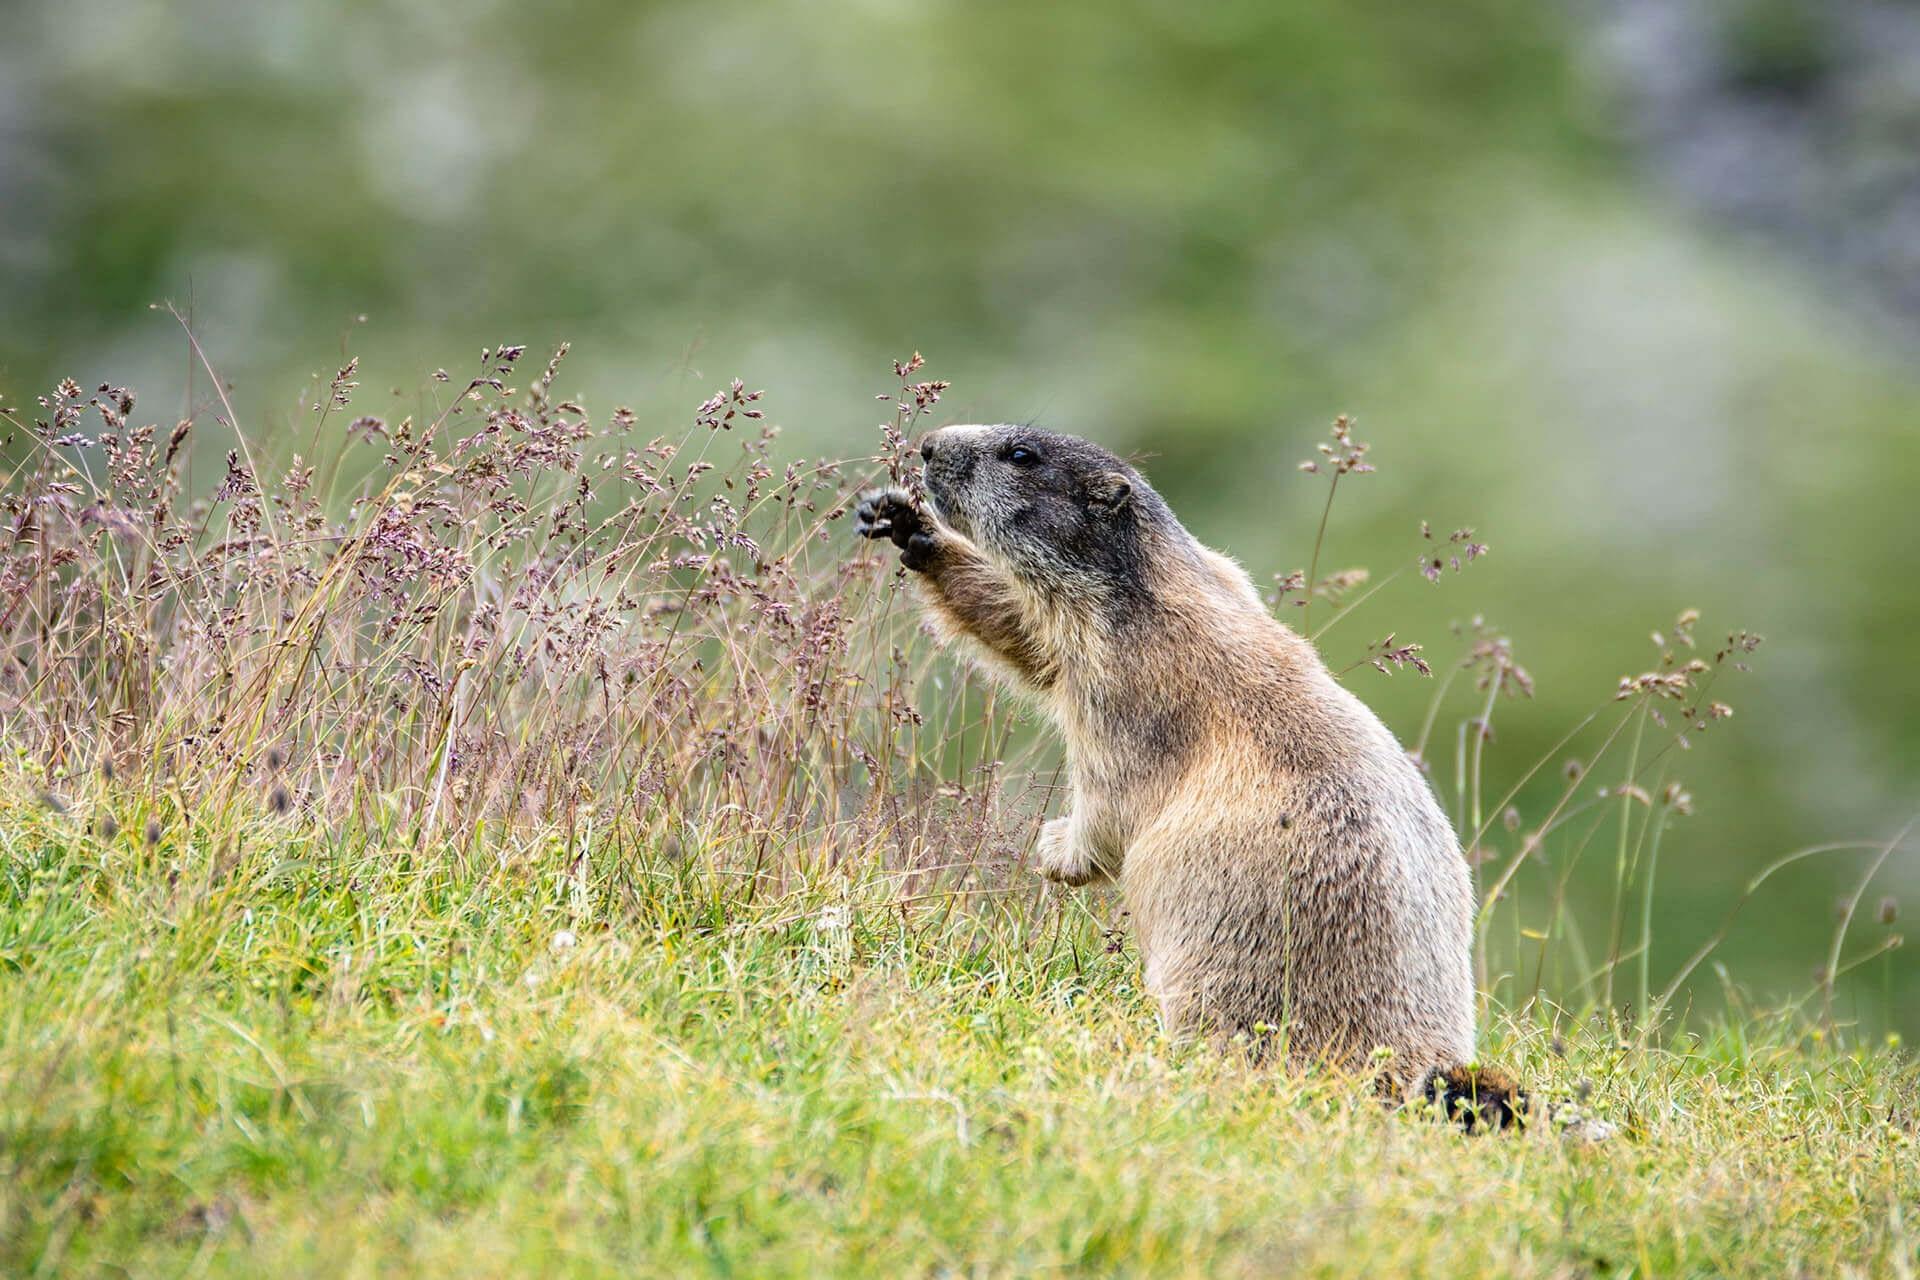 Grazing marmot